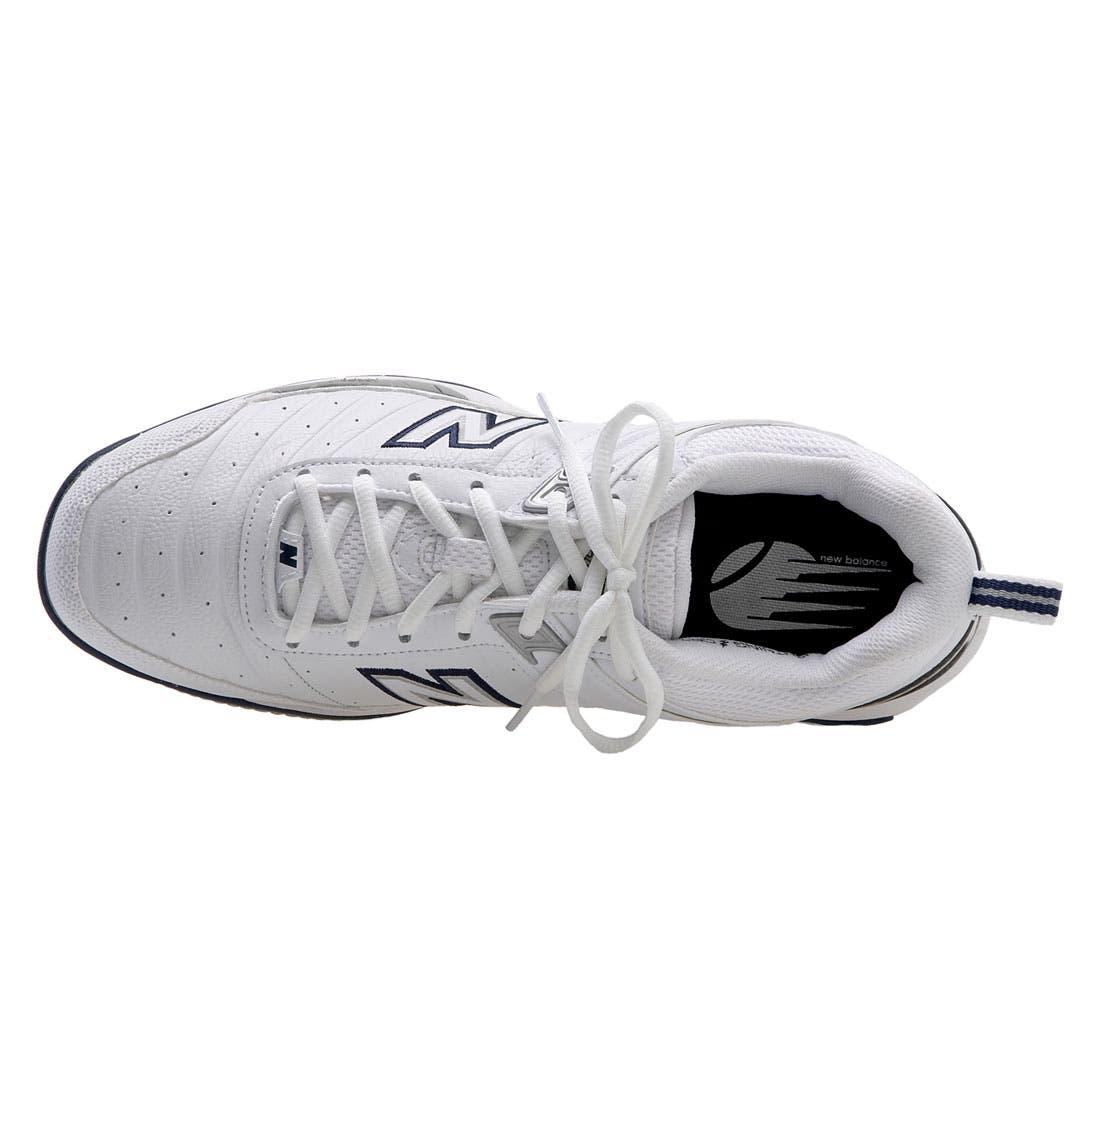 Alternate Image 2  - New Balance '804' Tennis Shoe (Men)